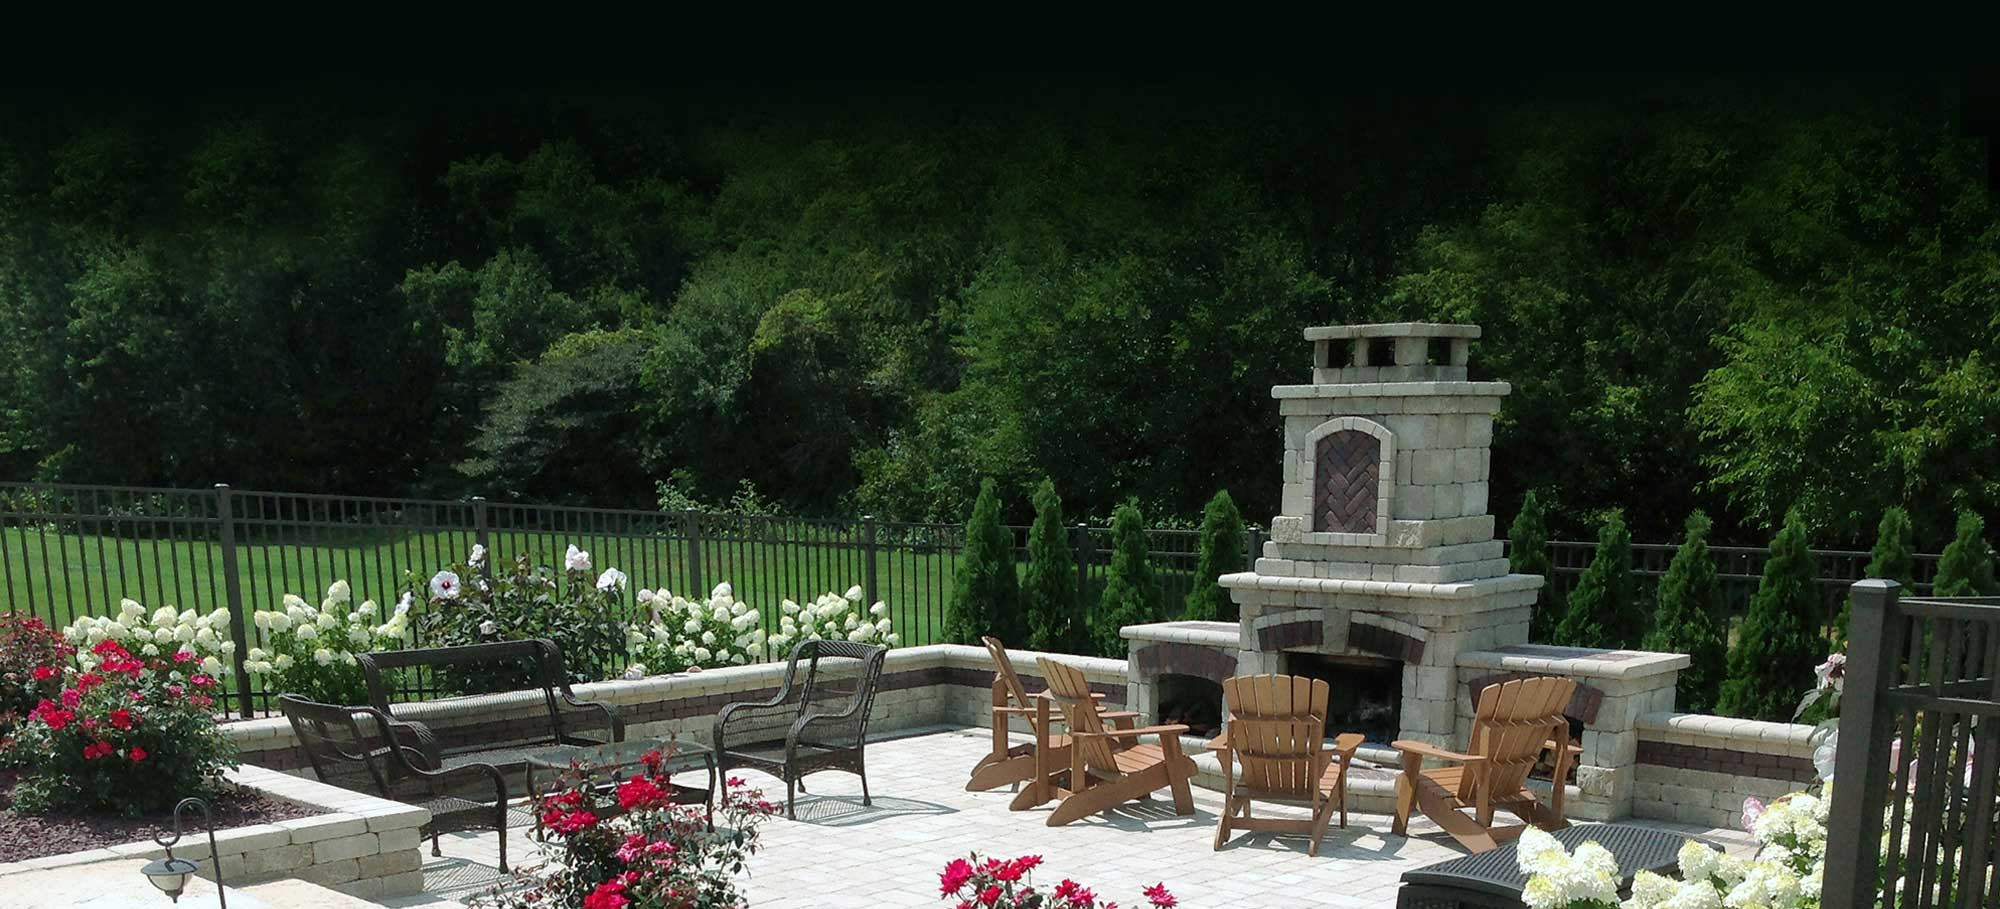 rlm full service residential commercial landscaping